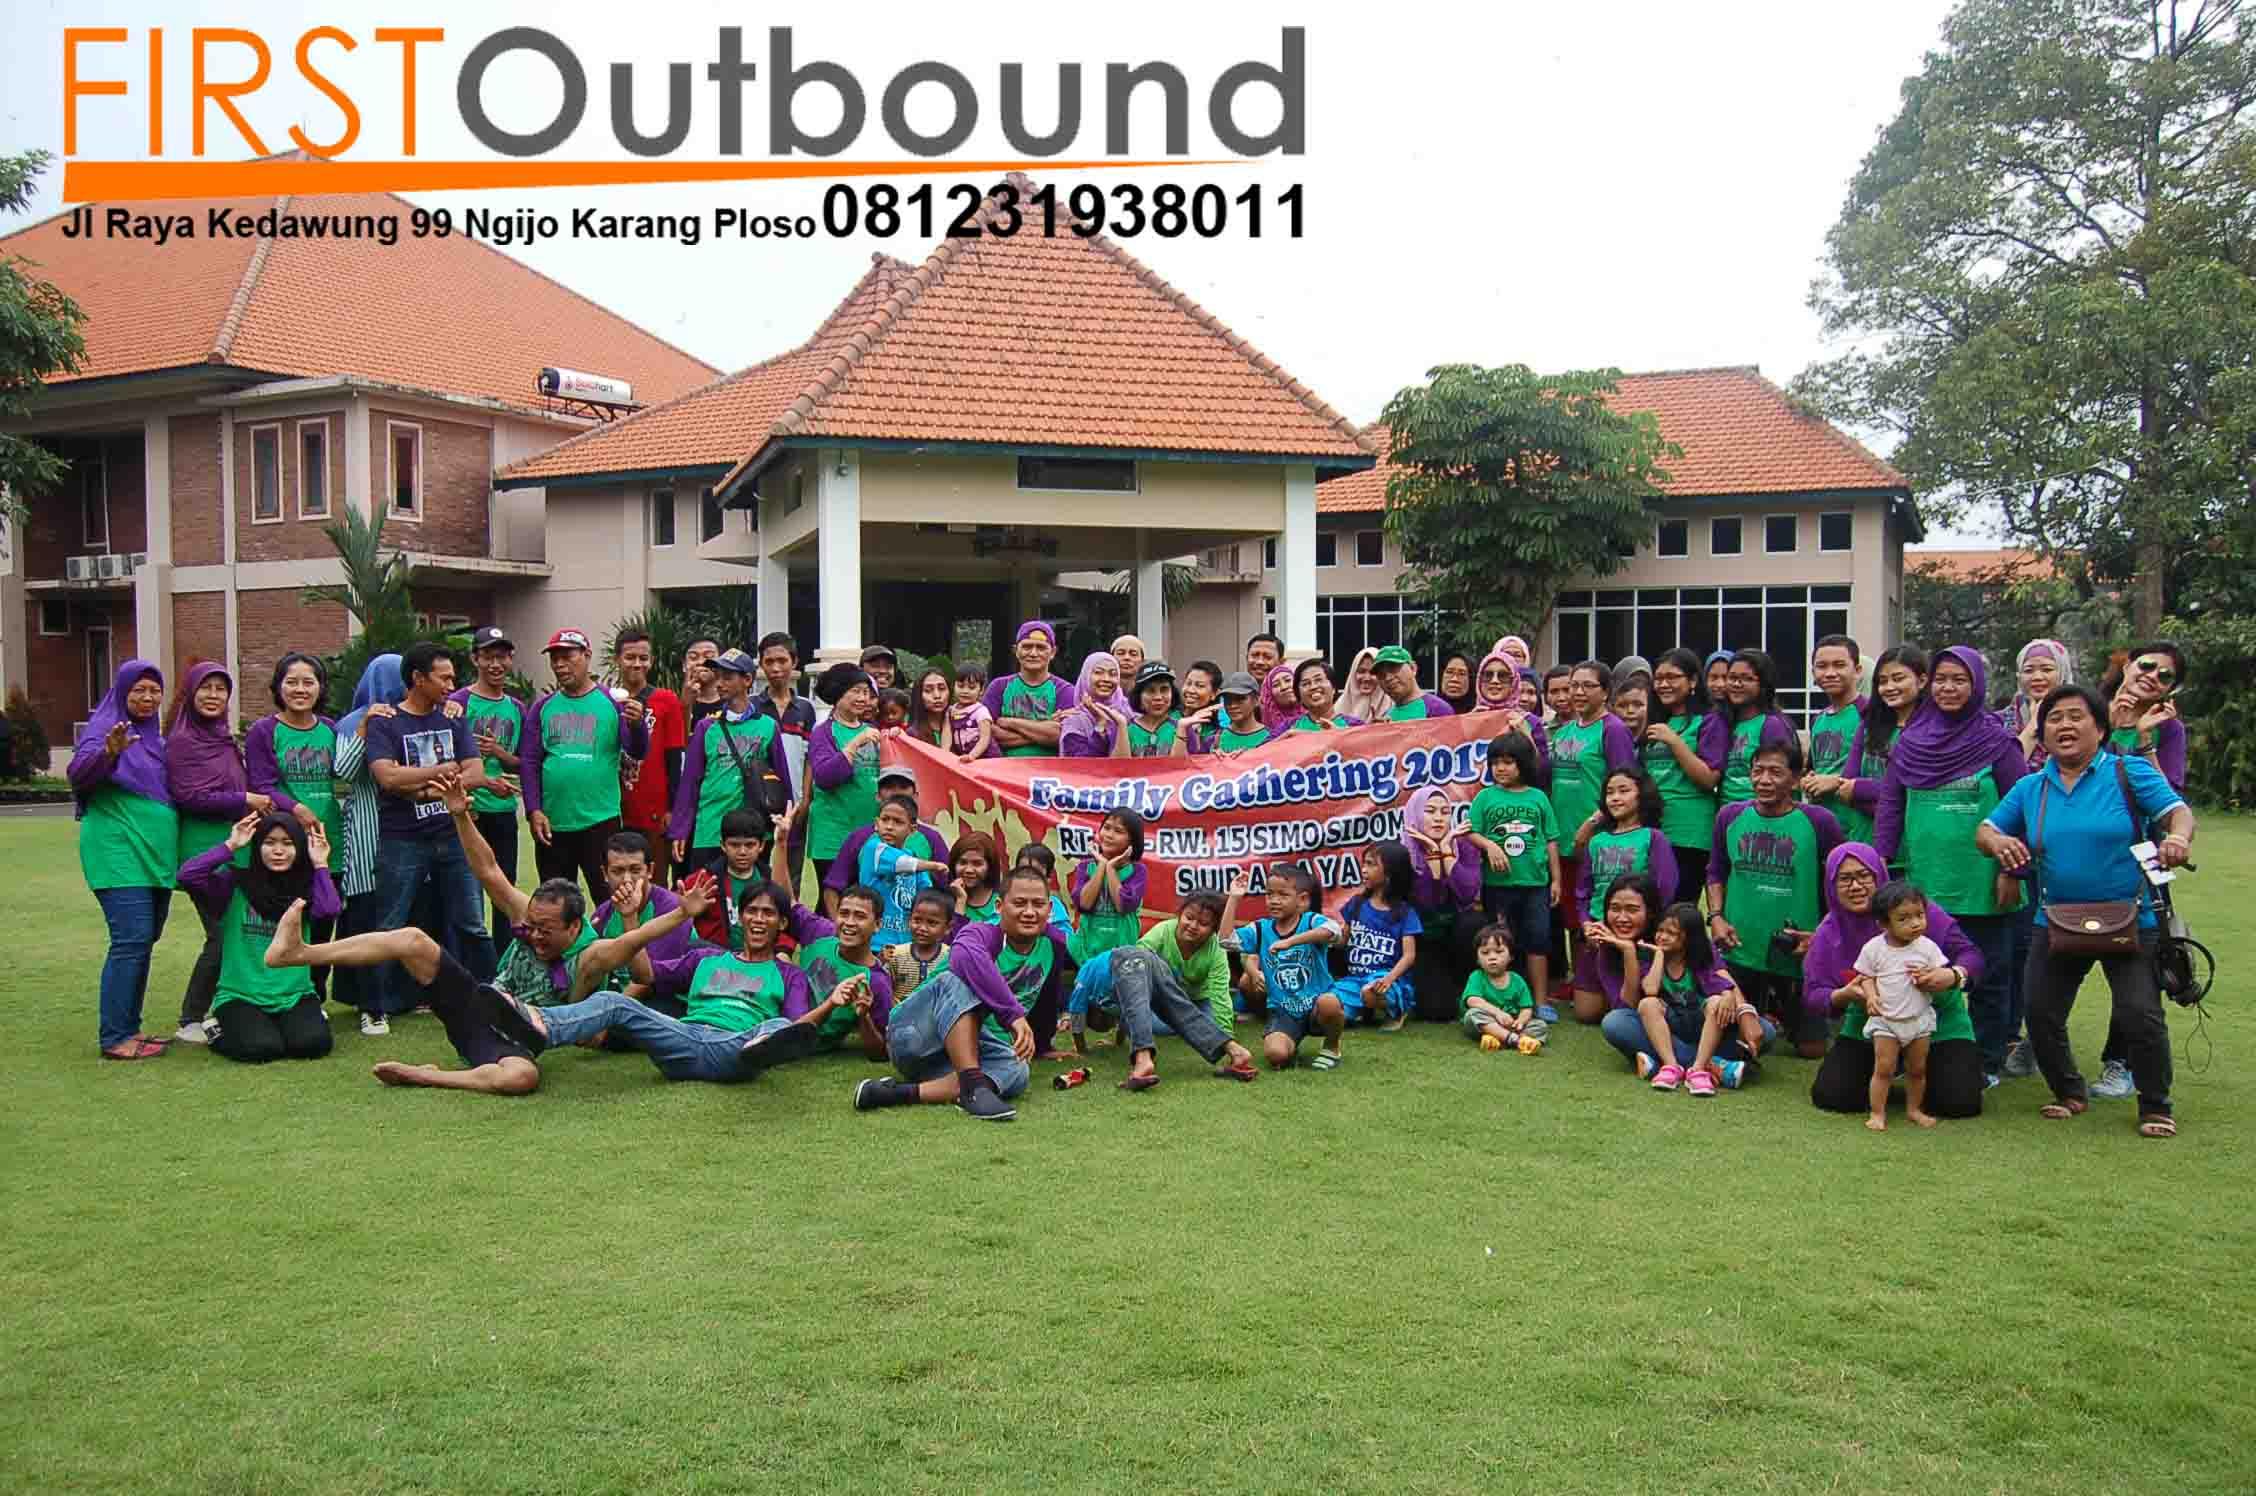 081231938011, Outbound Gathering Trawas, Outbound Gathering Tretes, Outbound Gathering Warga Surabaya